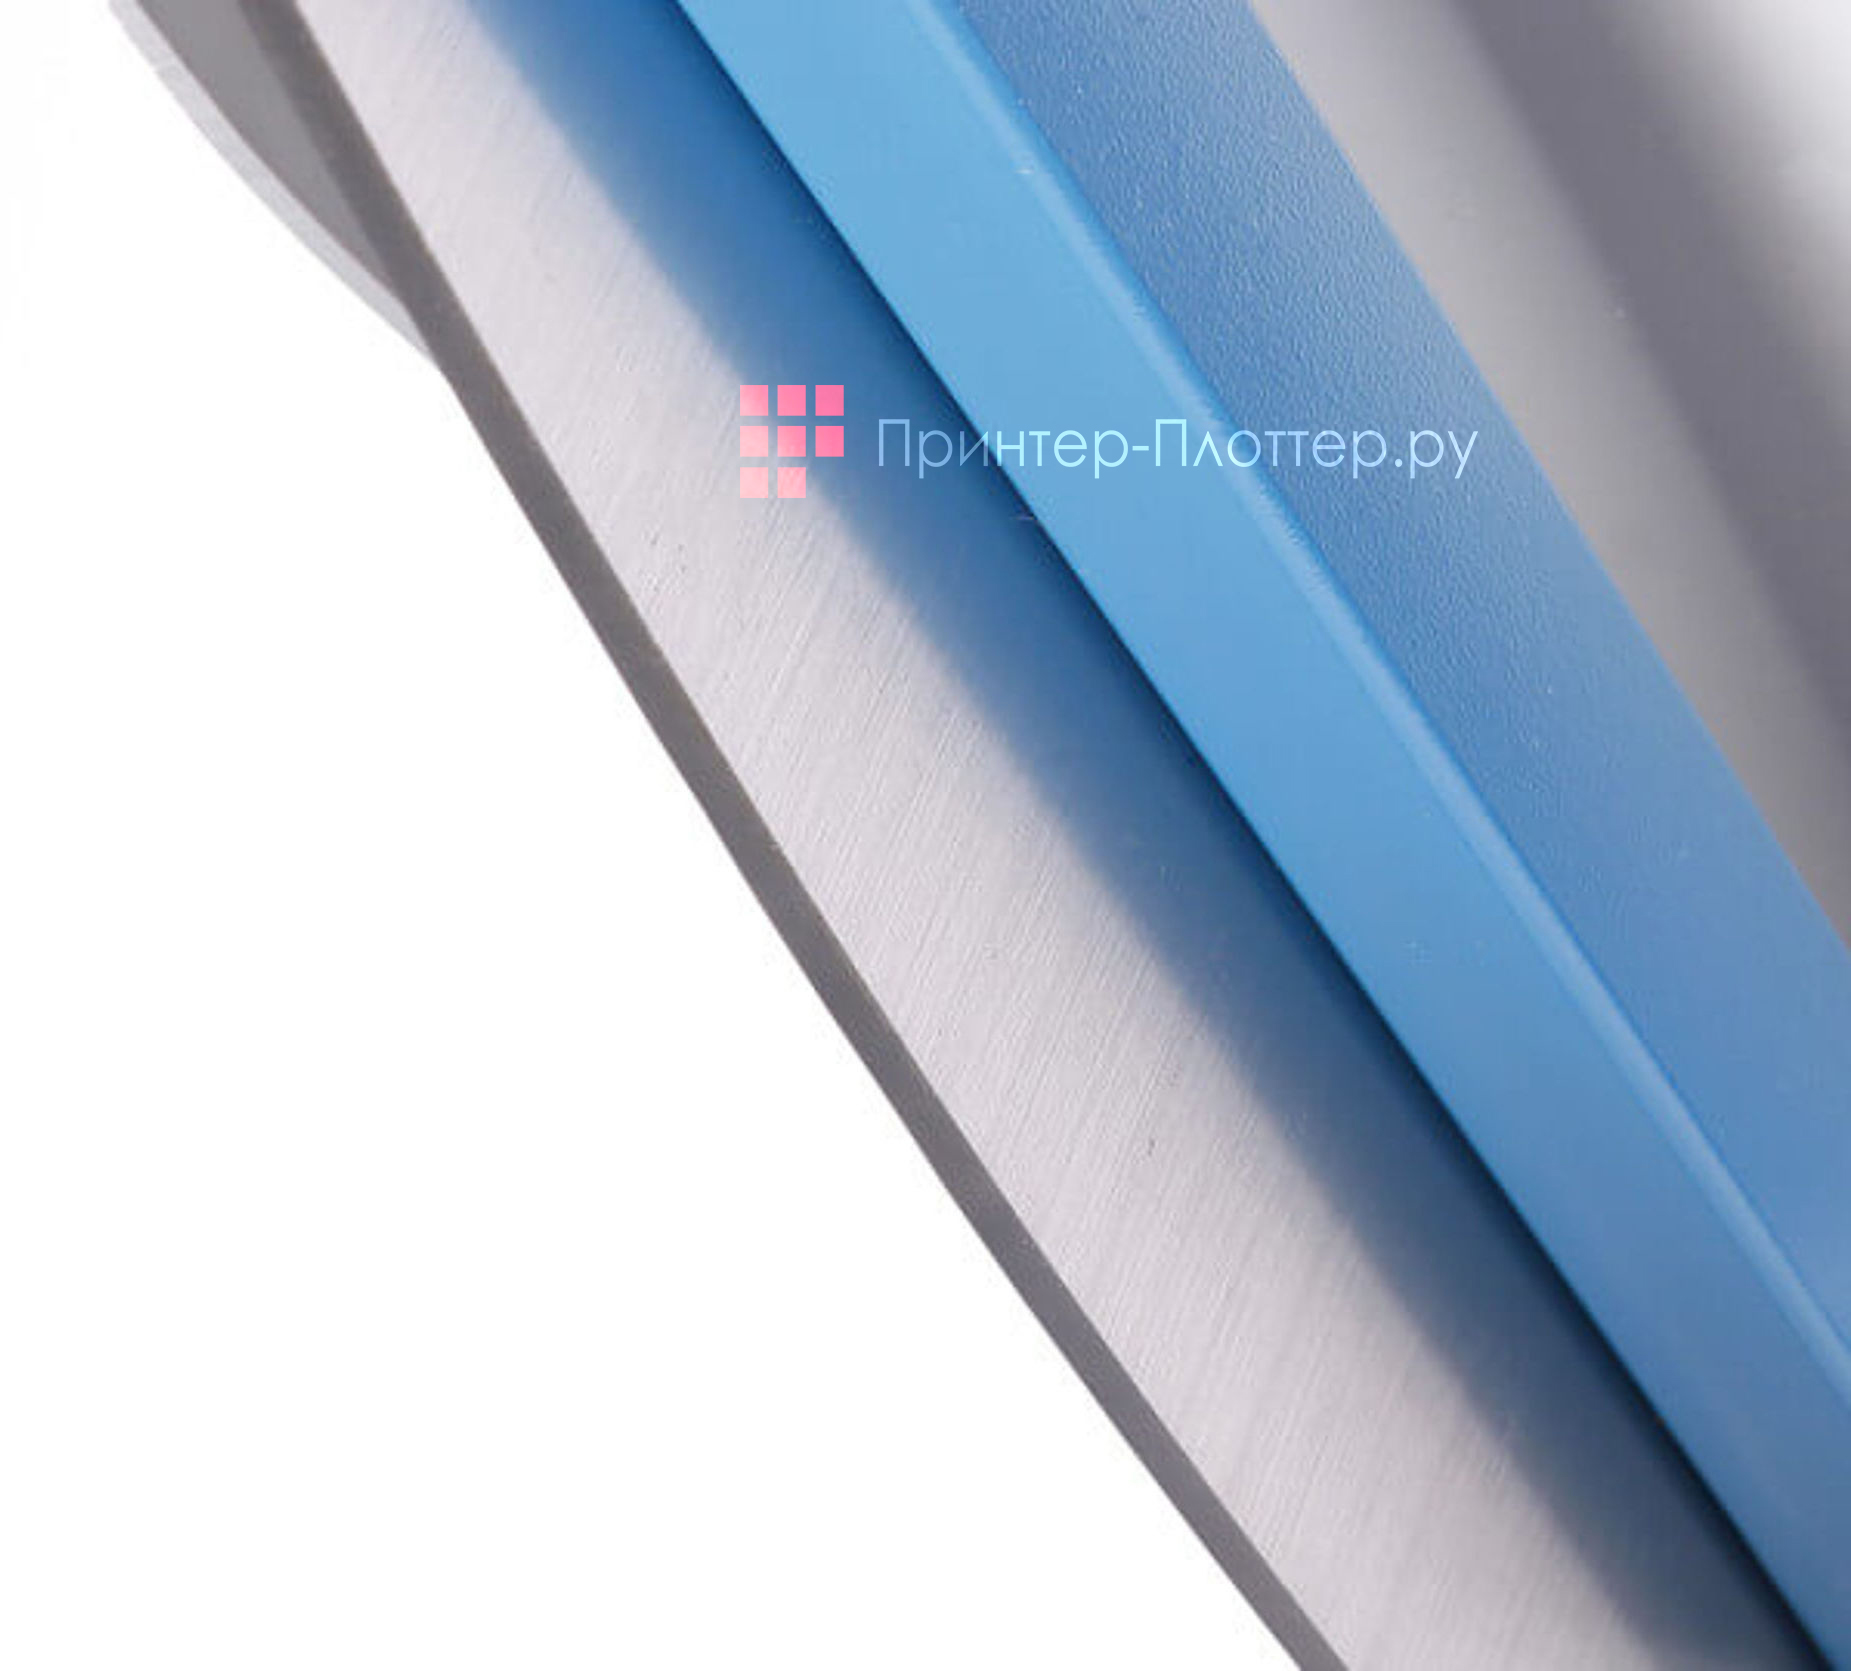 Dahle 597. Нож для материалов